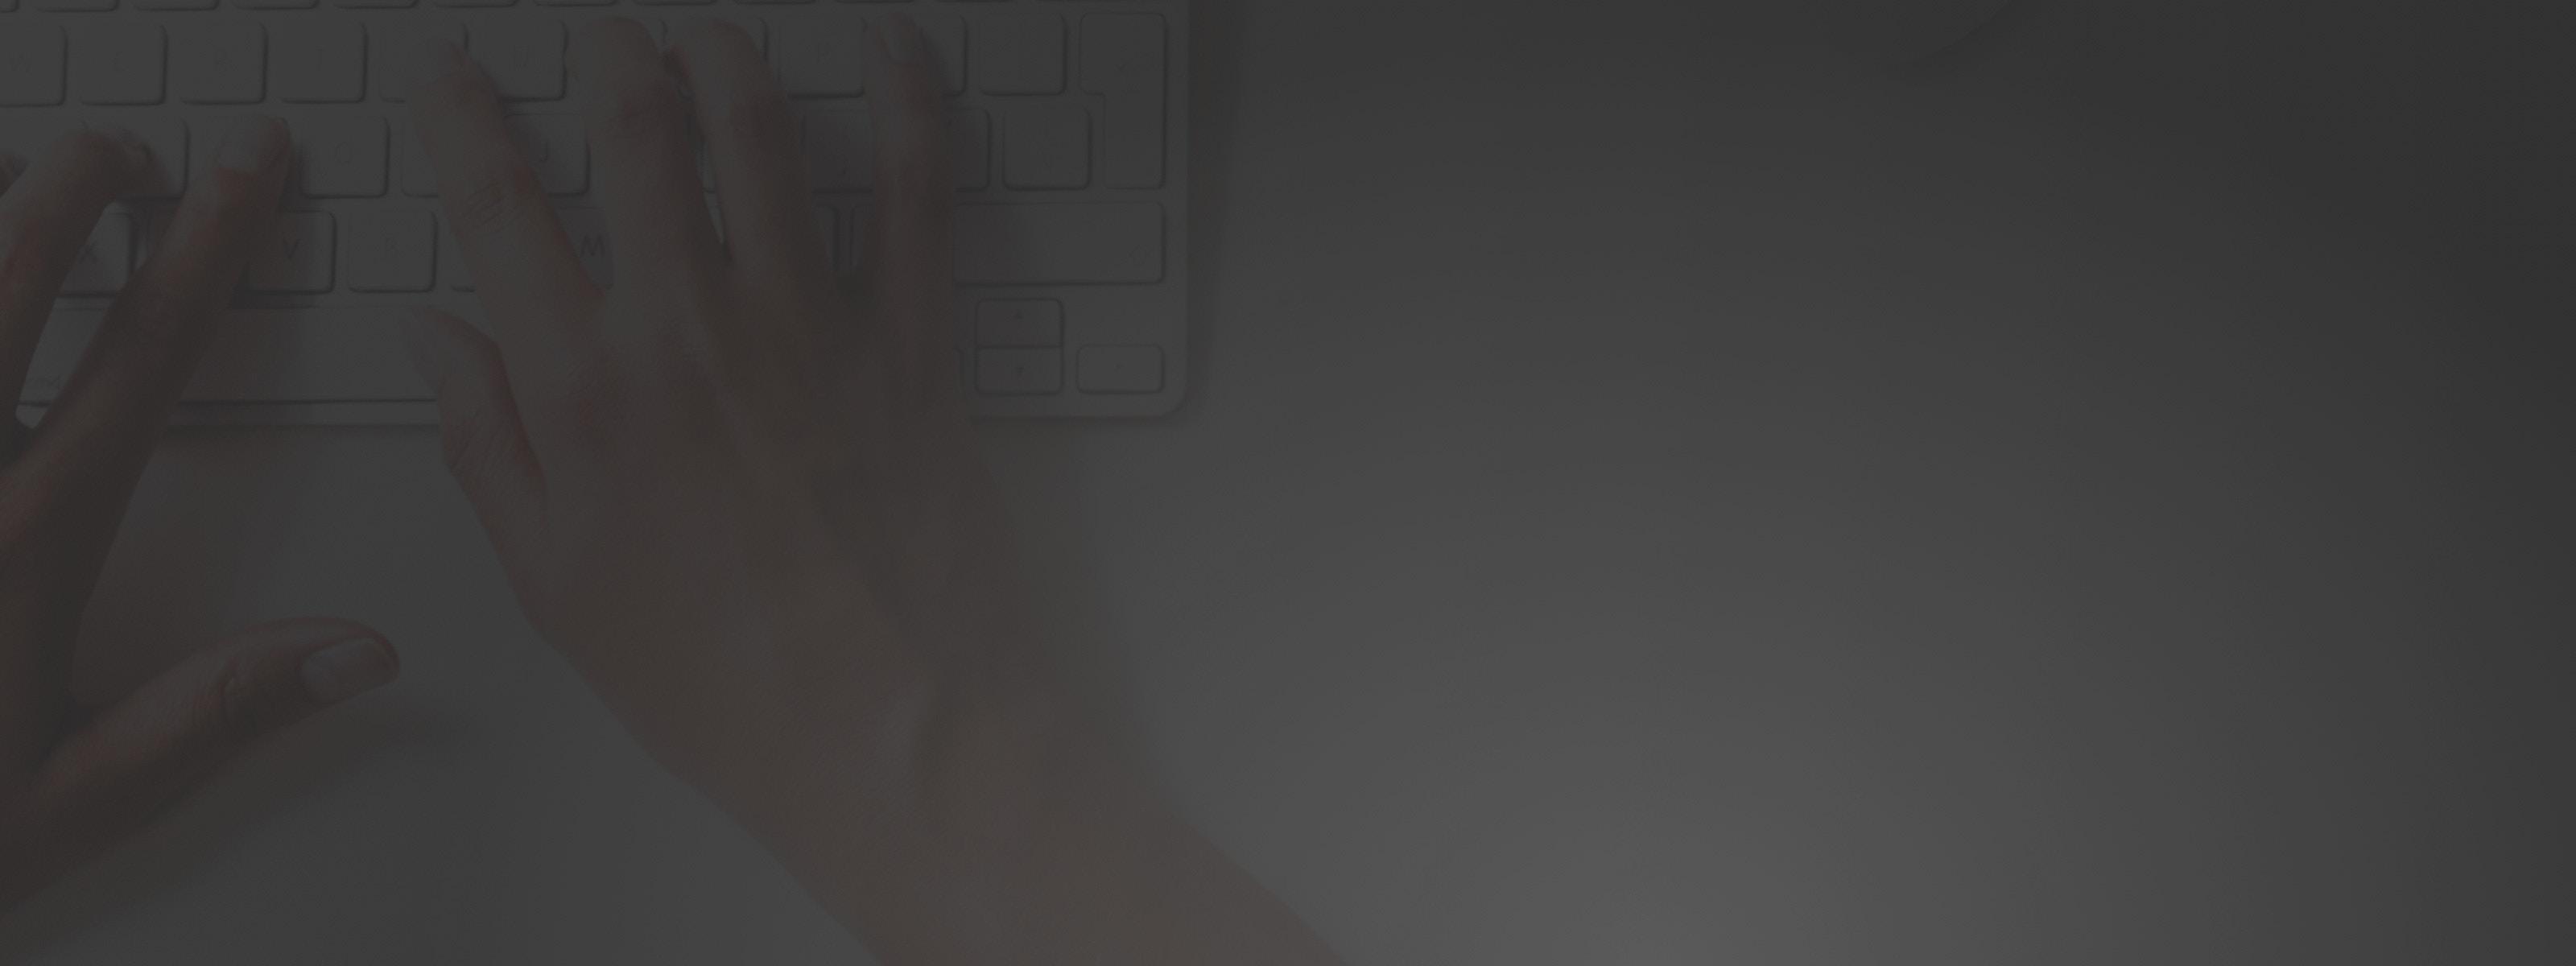 Pocket App hero image